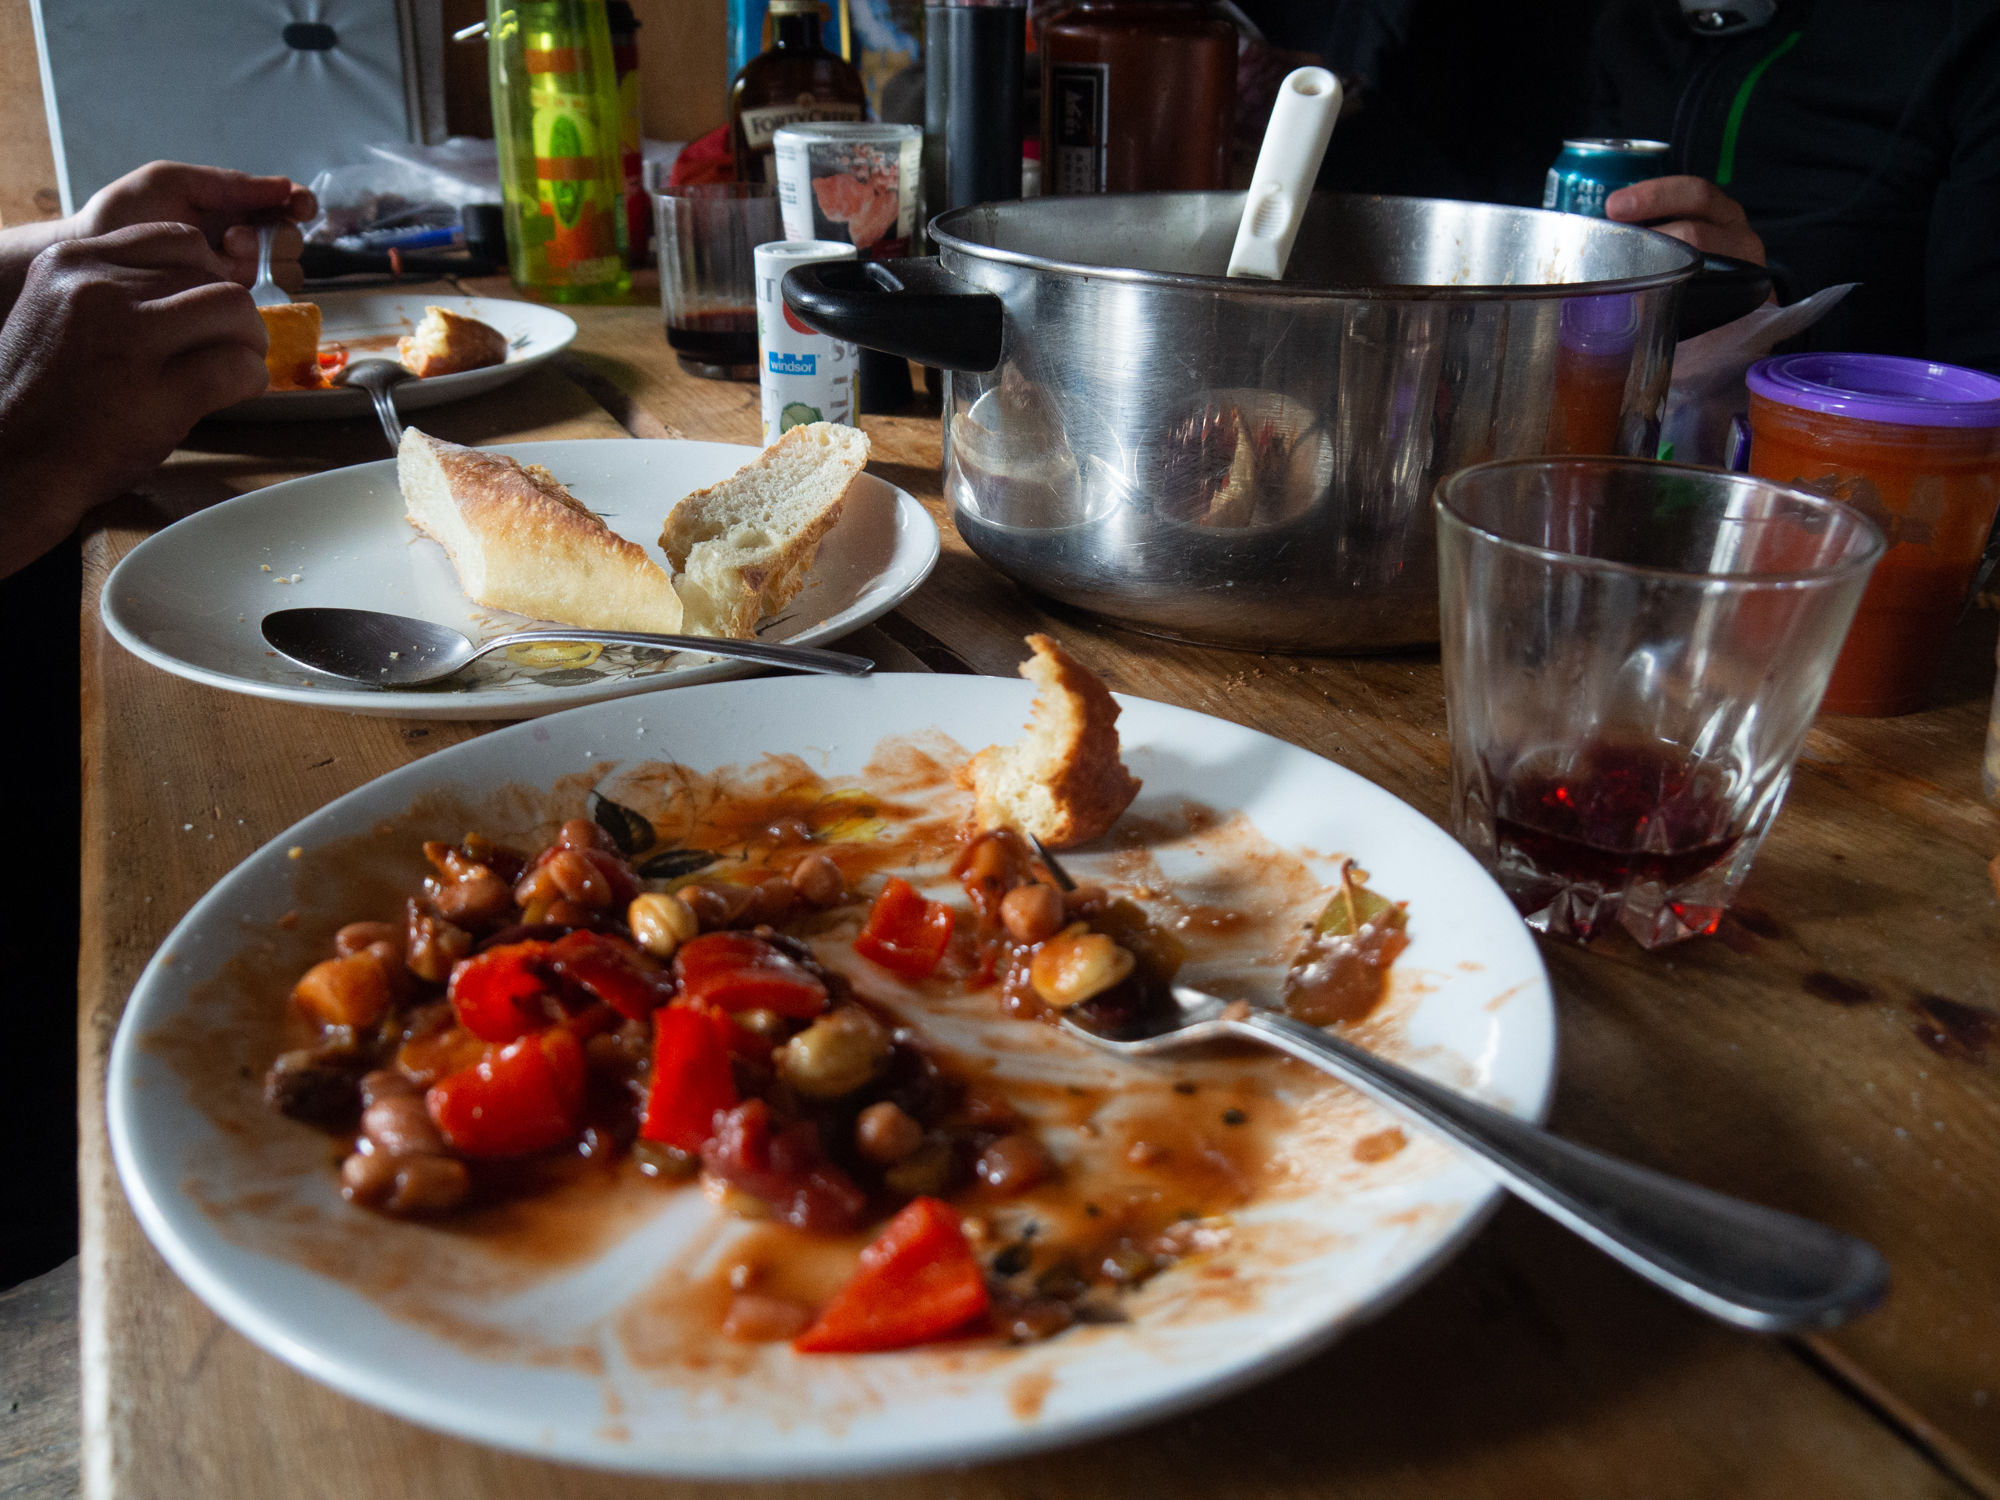 Vegetarian Cashew Chili for Camping